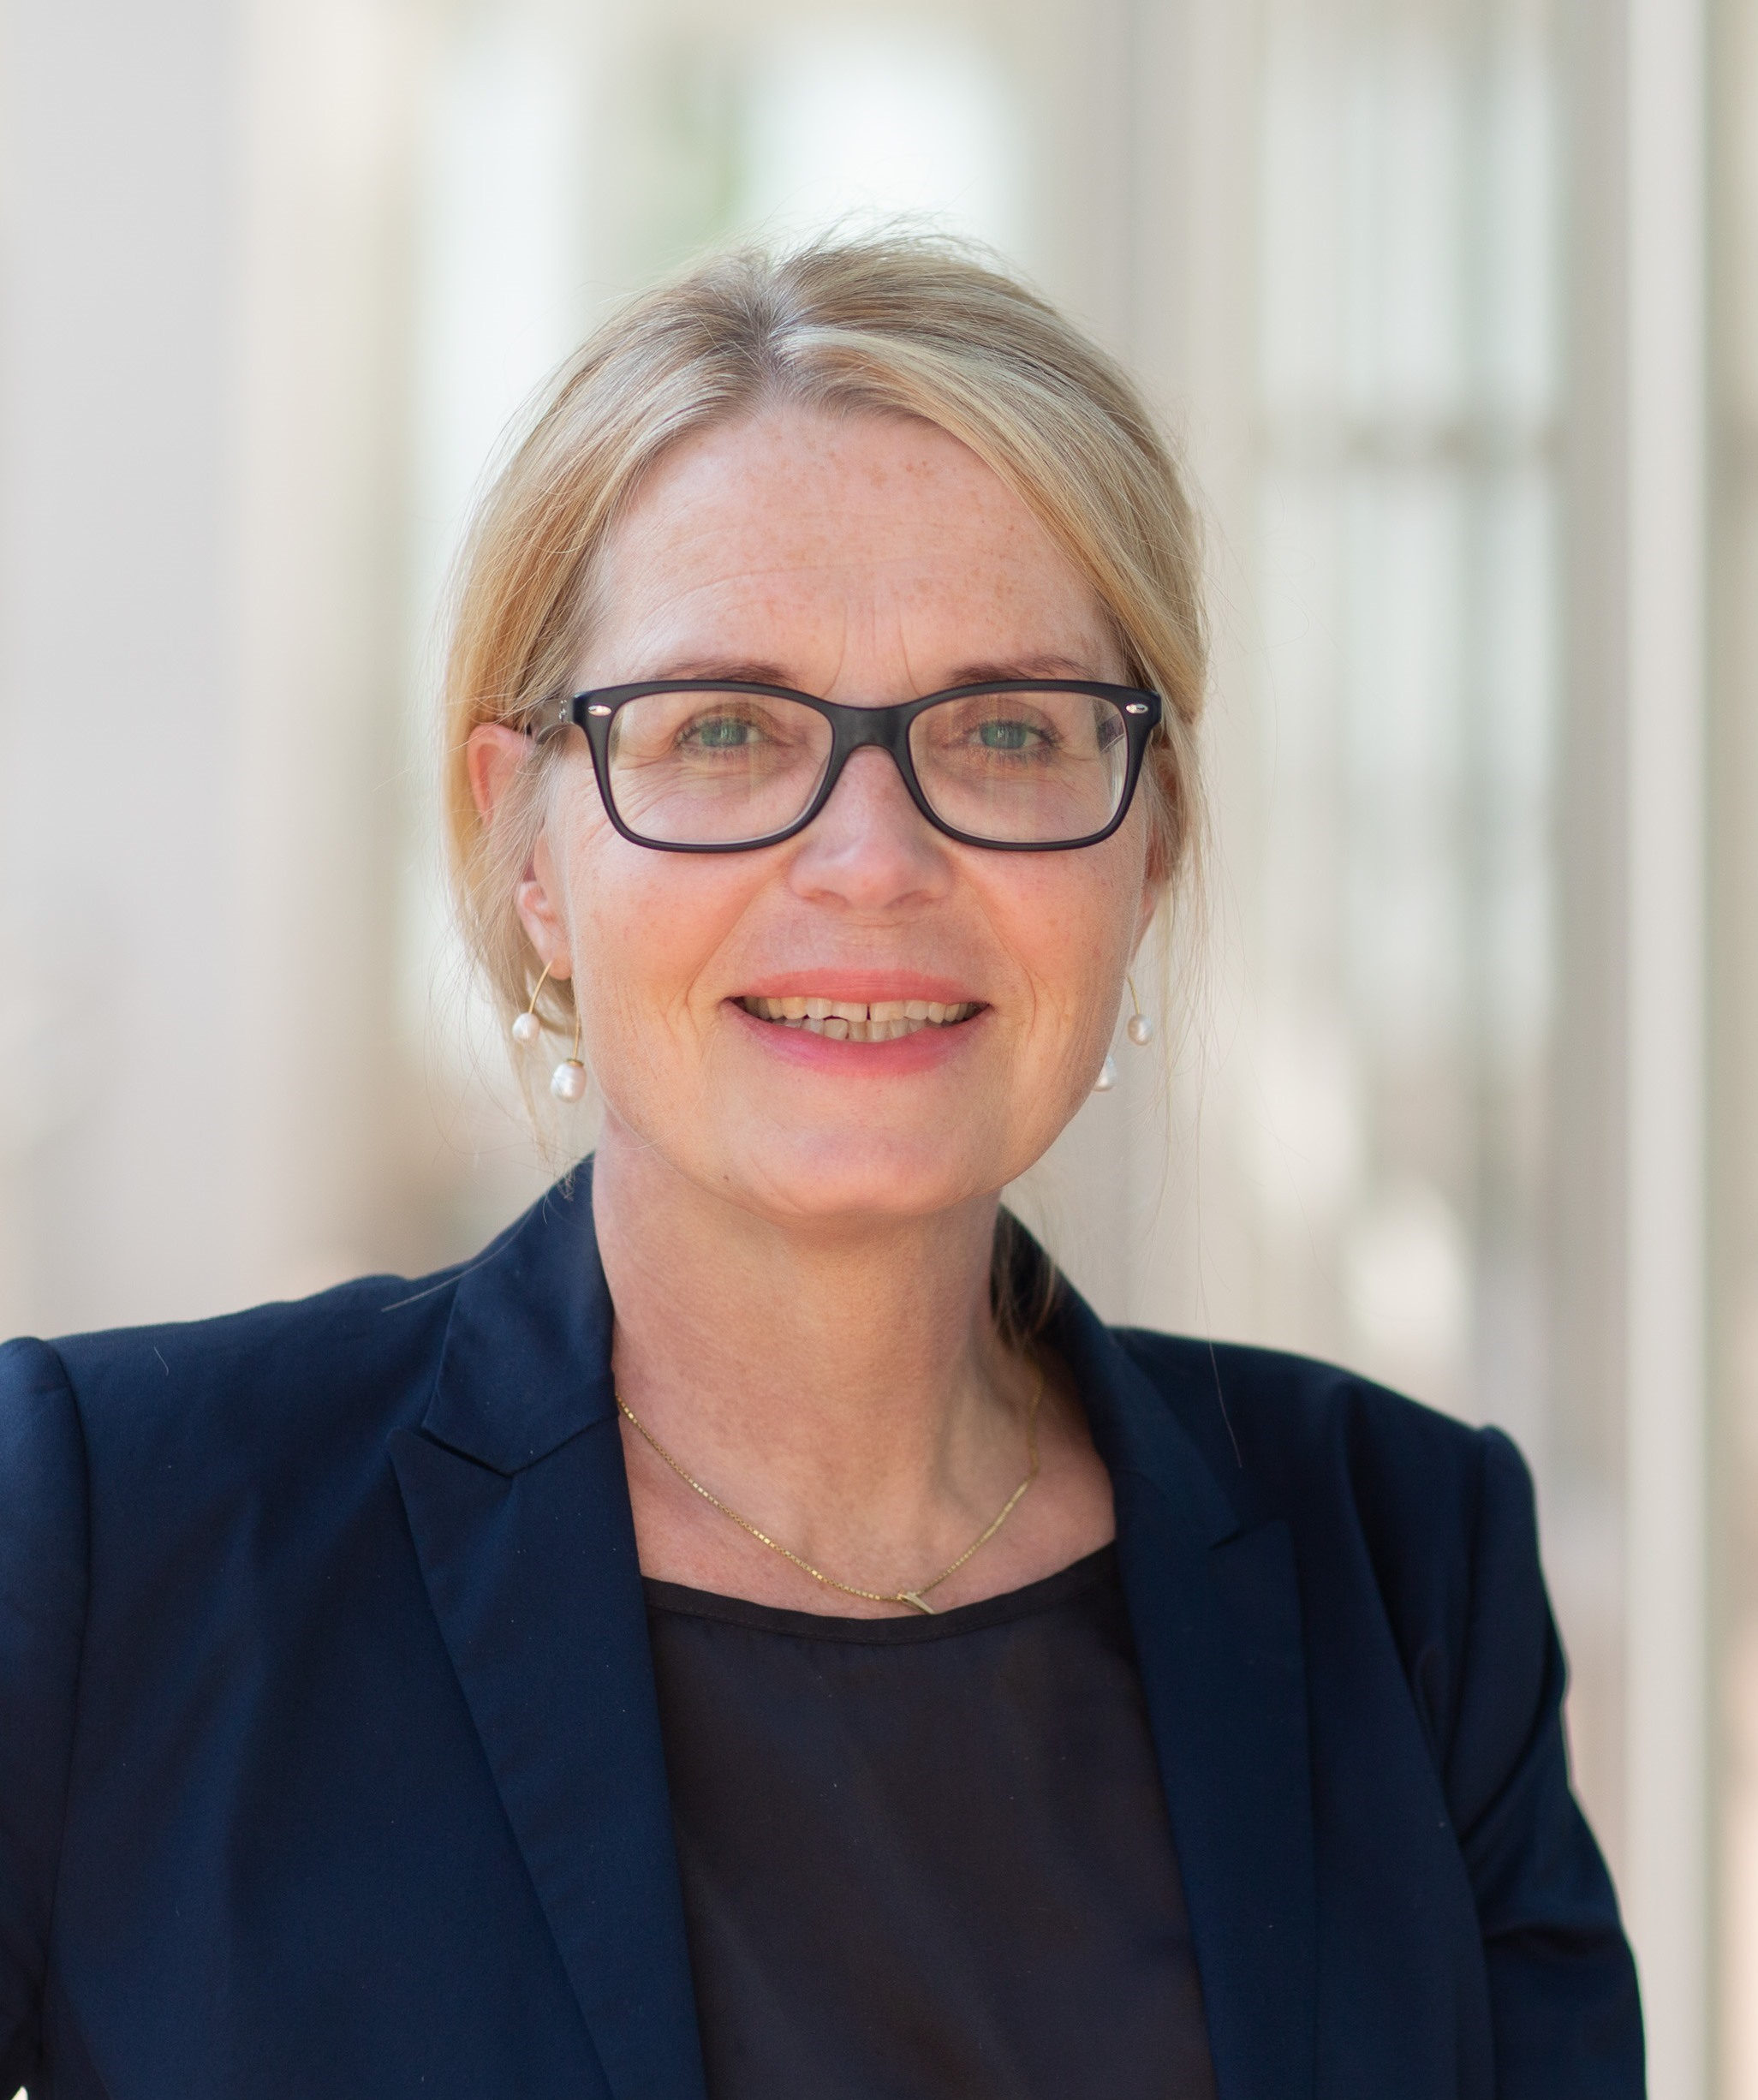 Dr. Cornelia Seitz